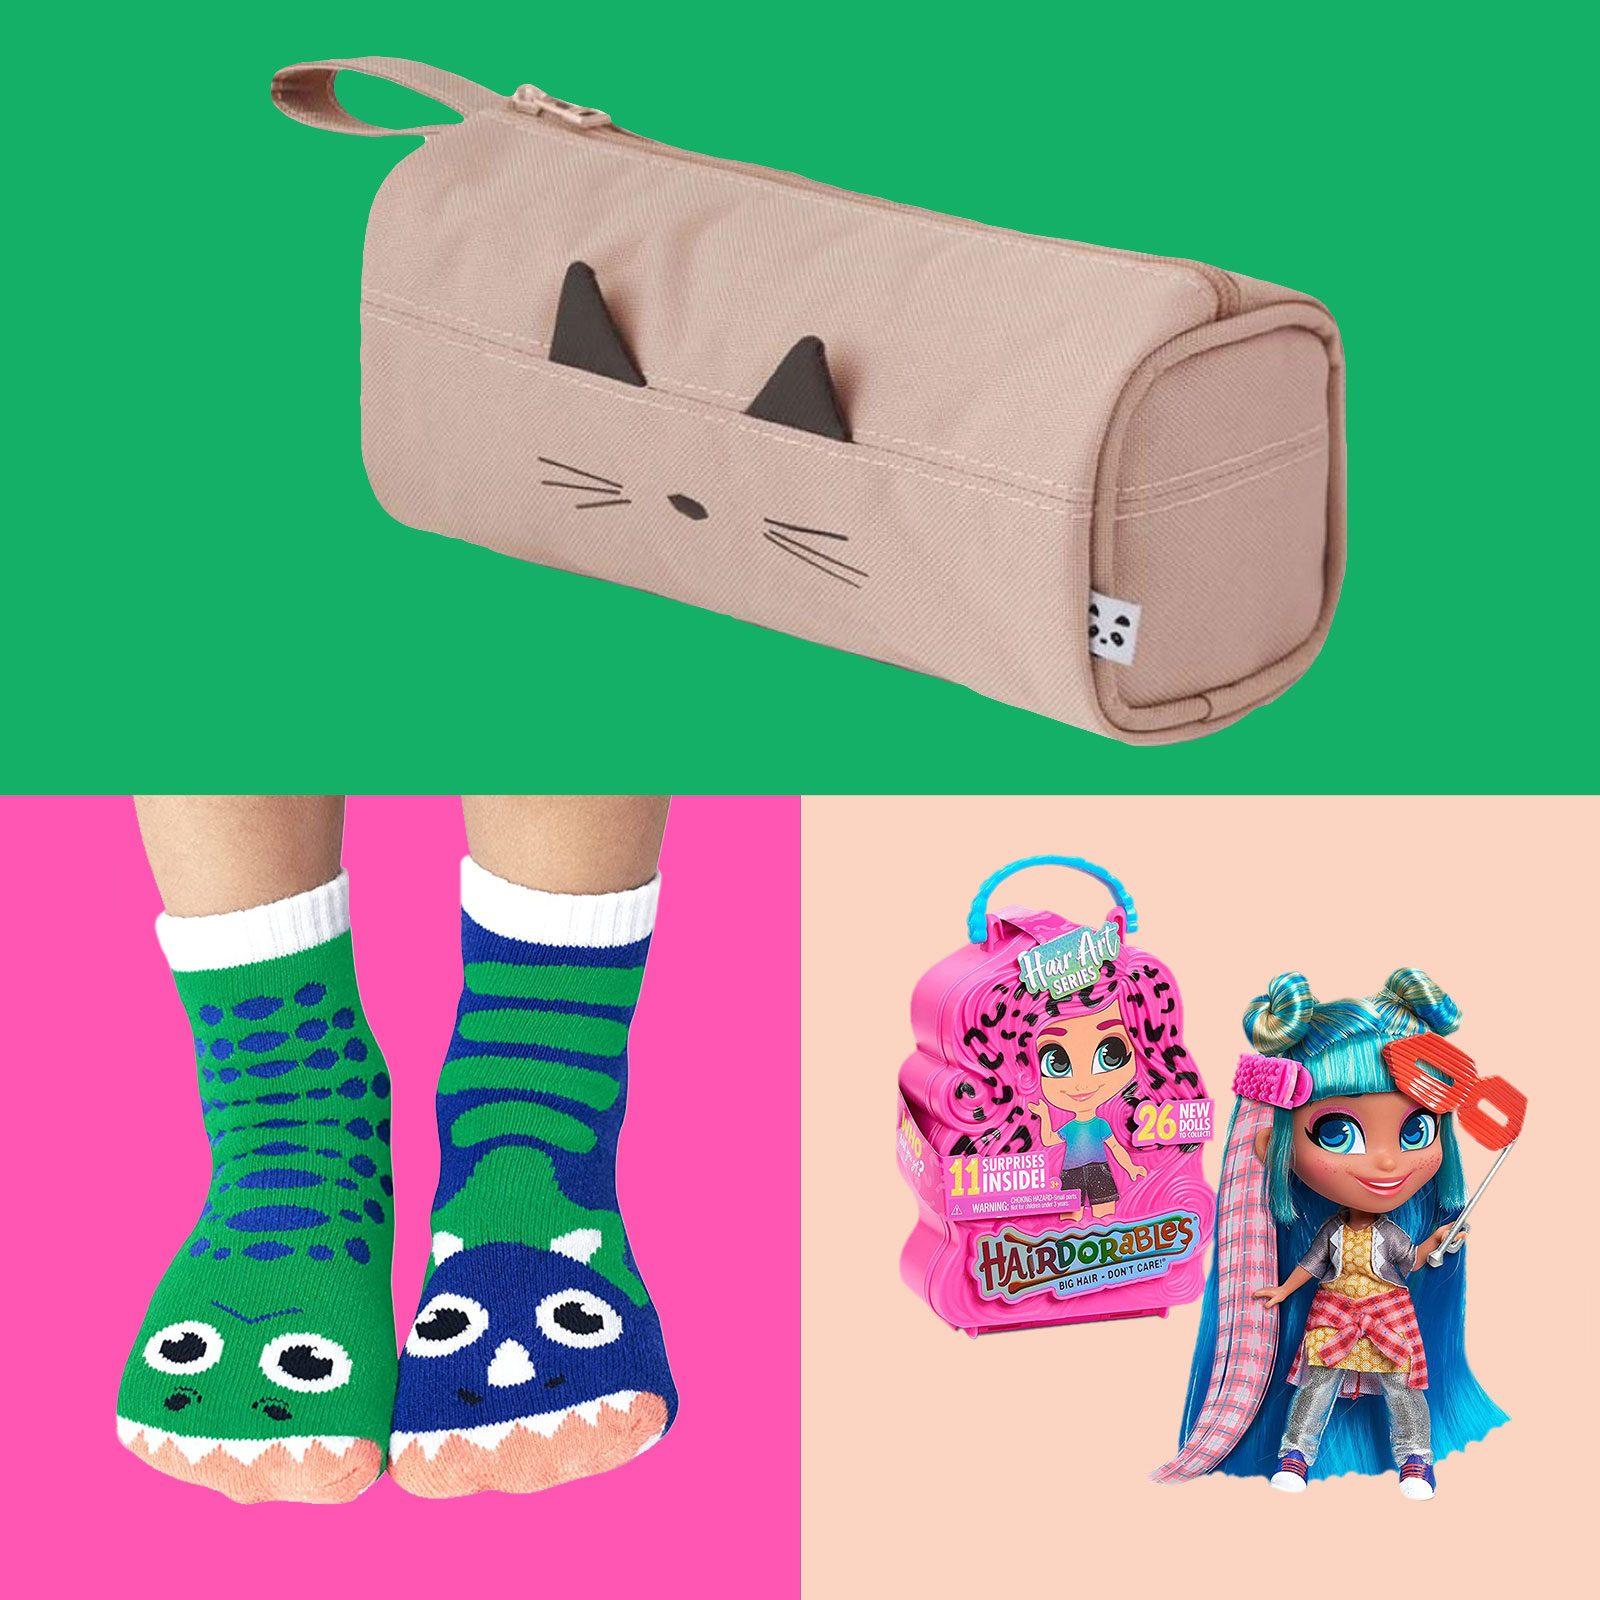 Three stocking stuffer ideas for kids